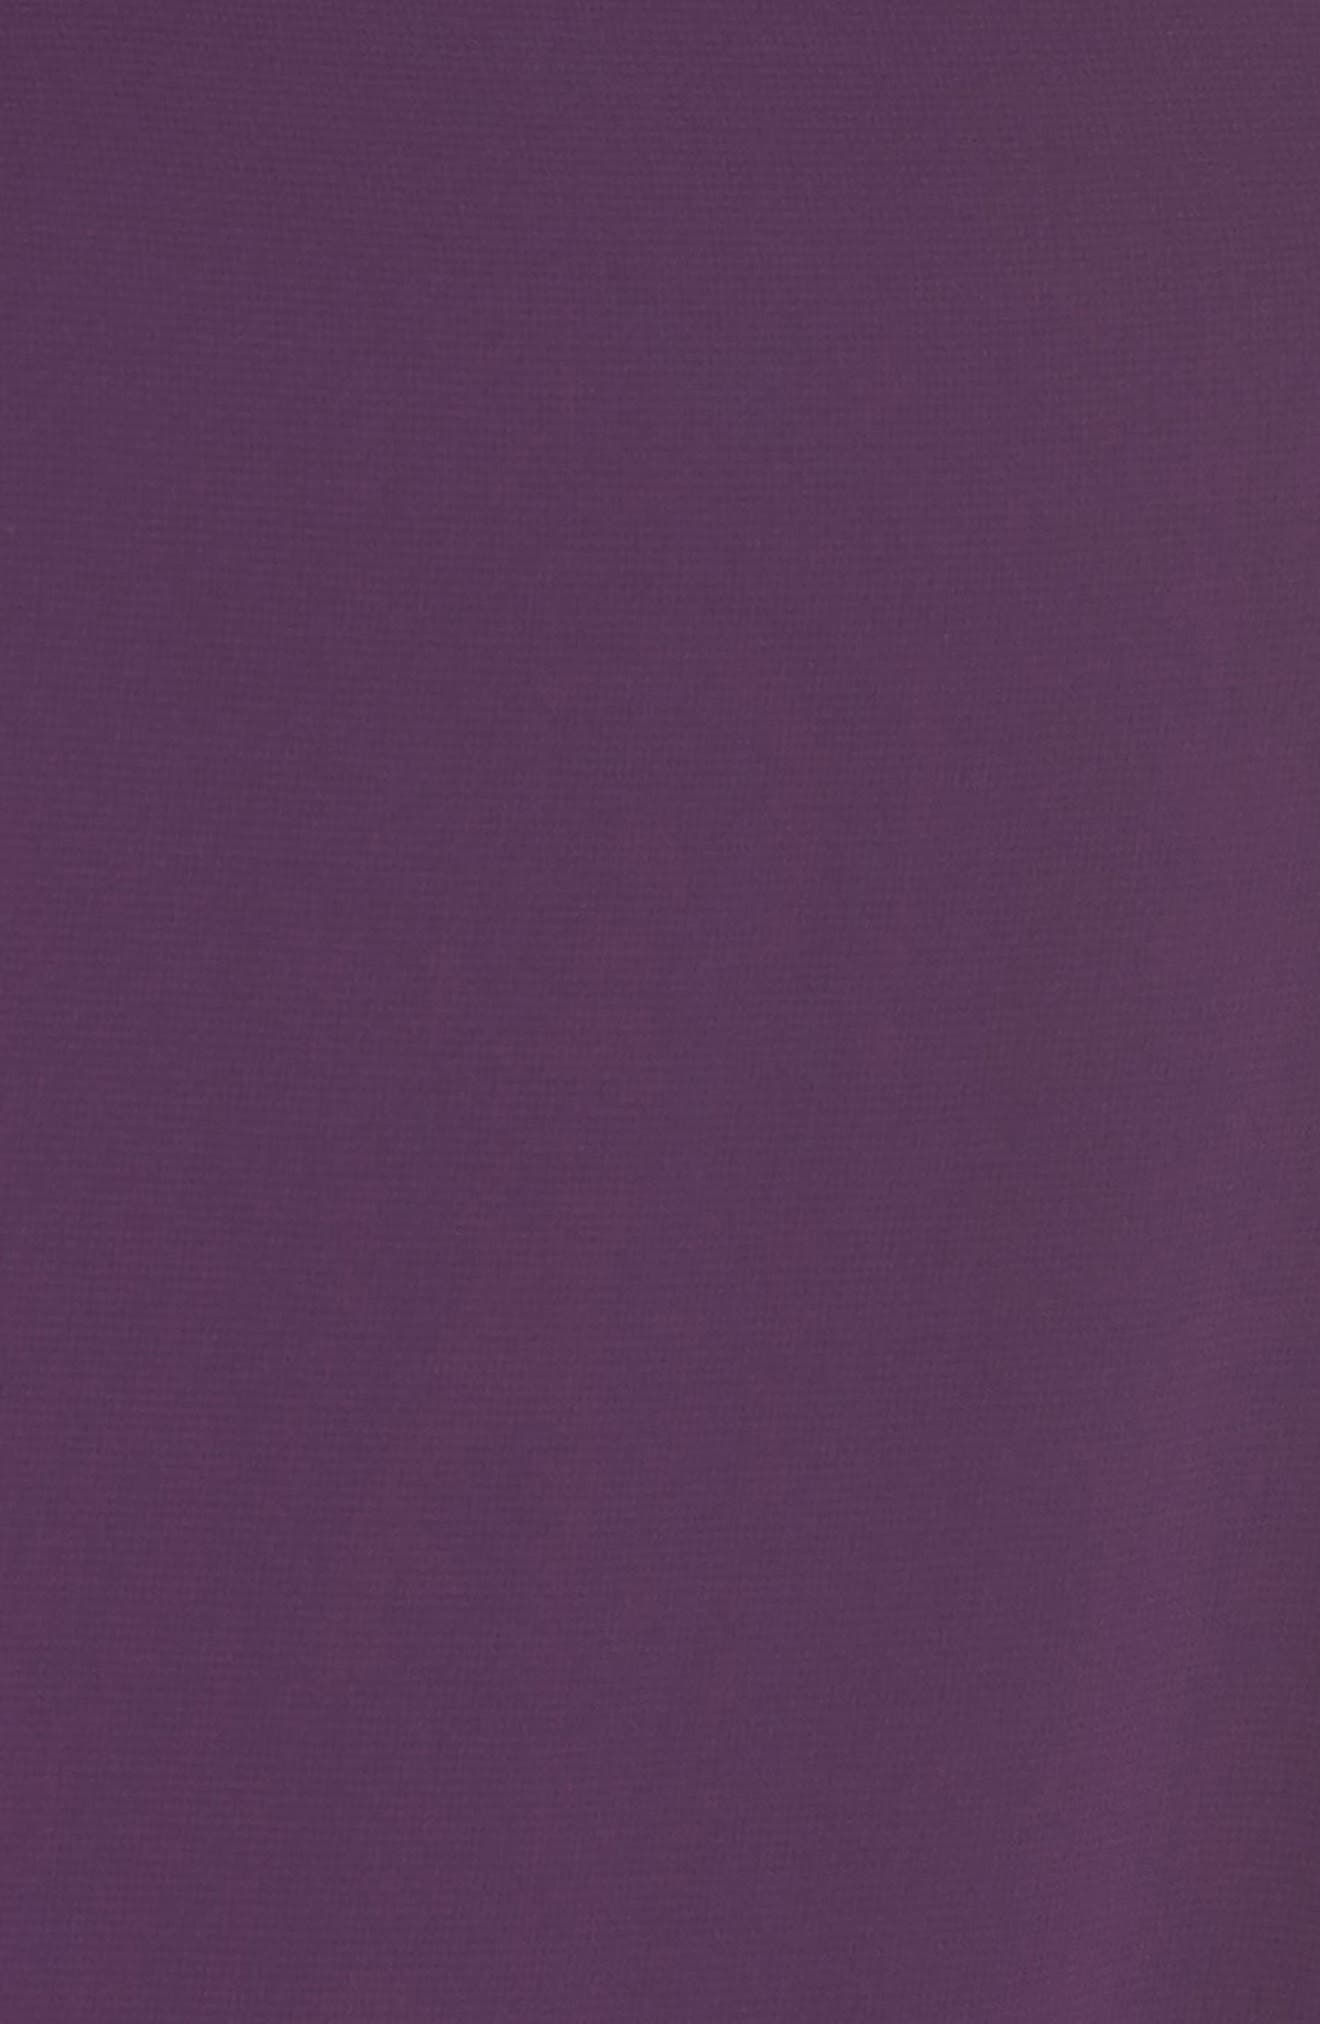 Chiffon Overlay Sheath Dress,                             Alternate thumbnail 6, color,                             PLUM